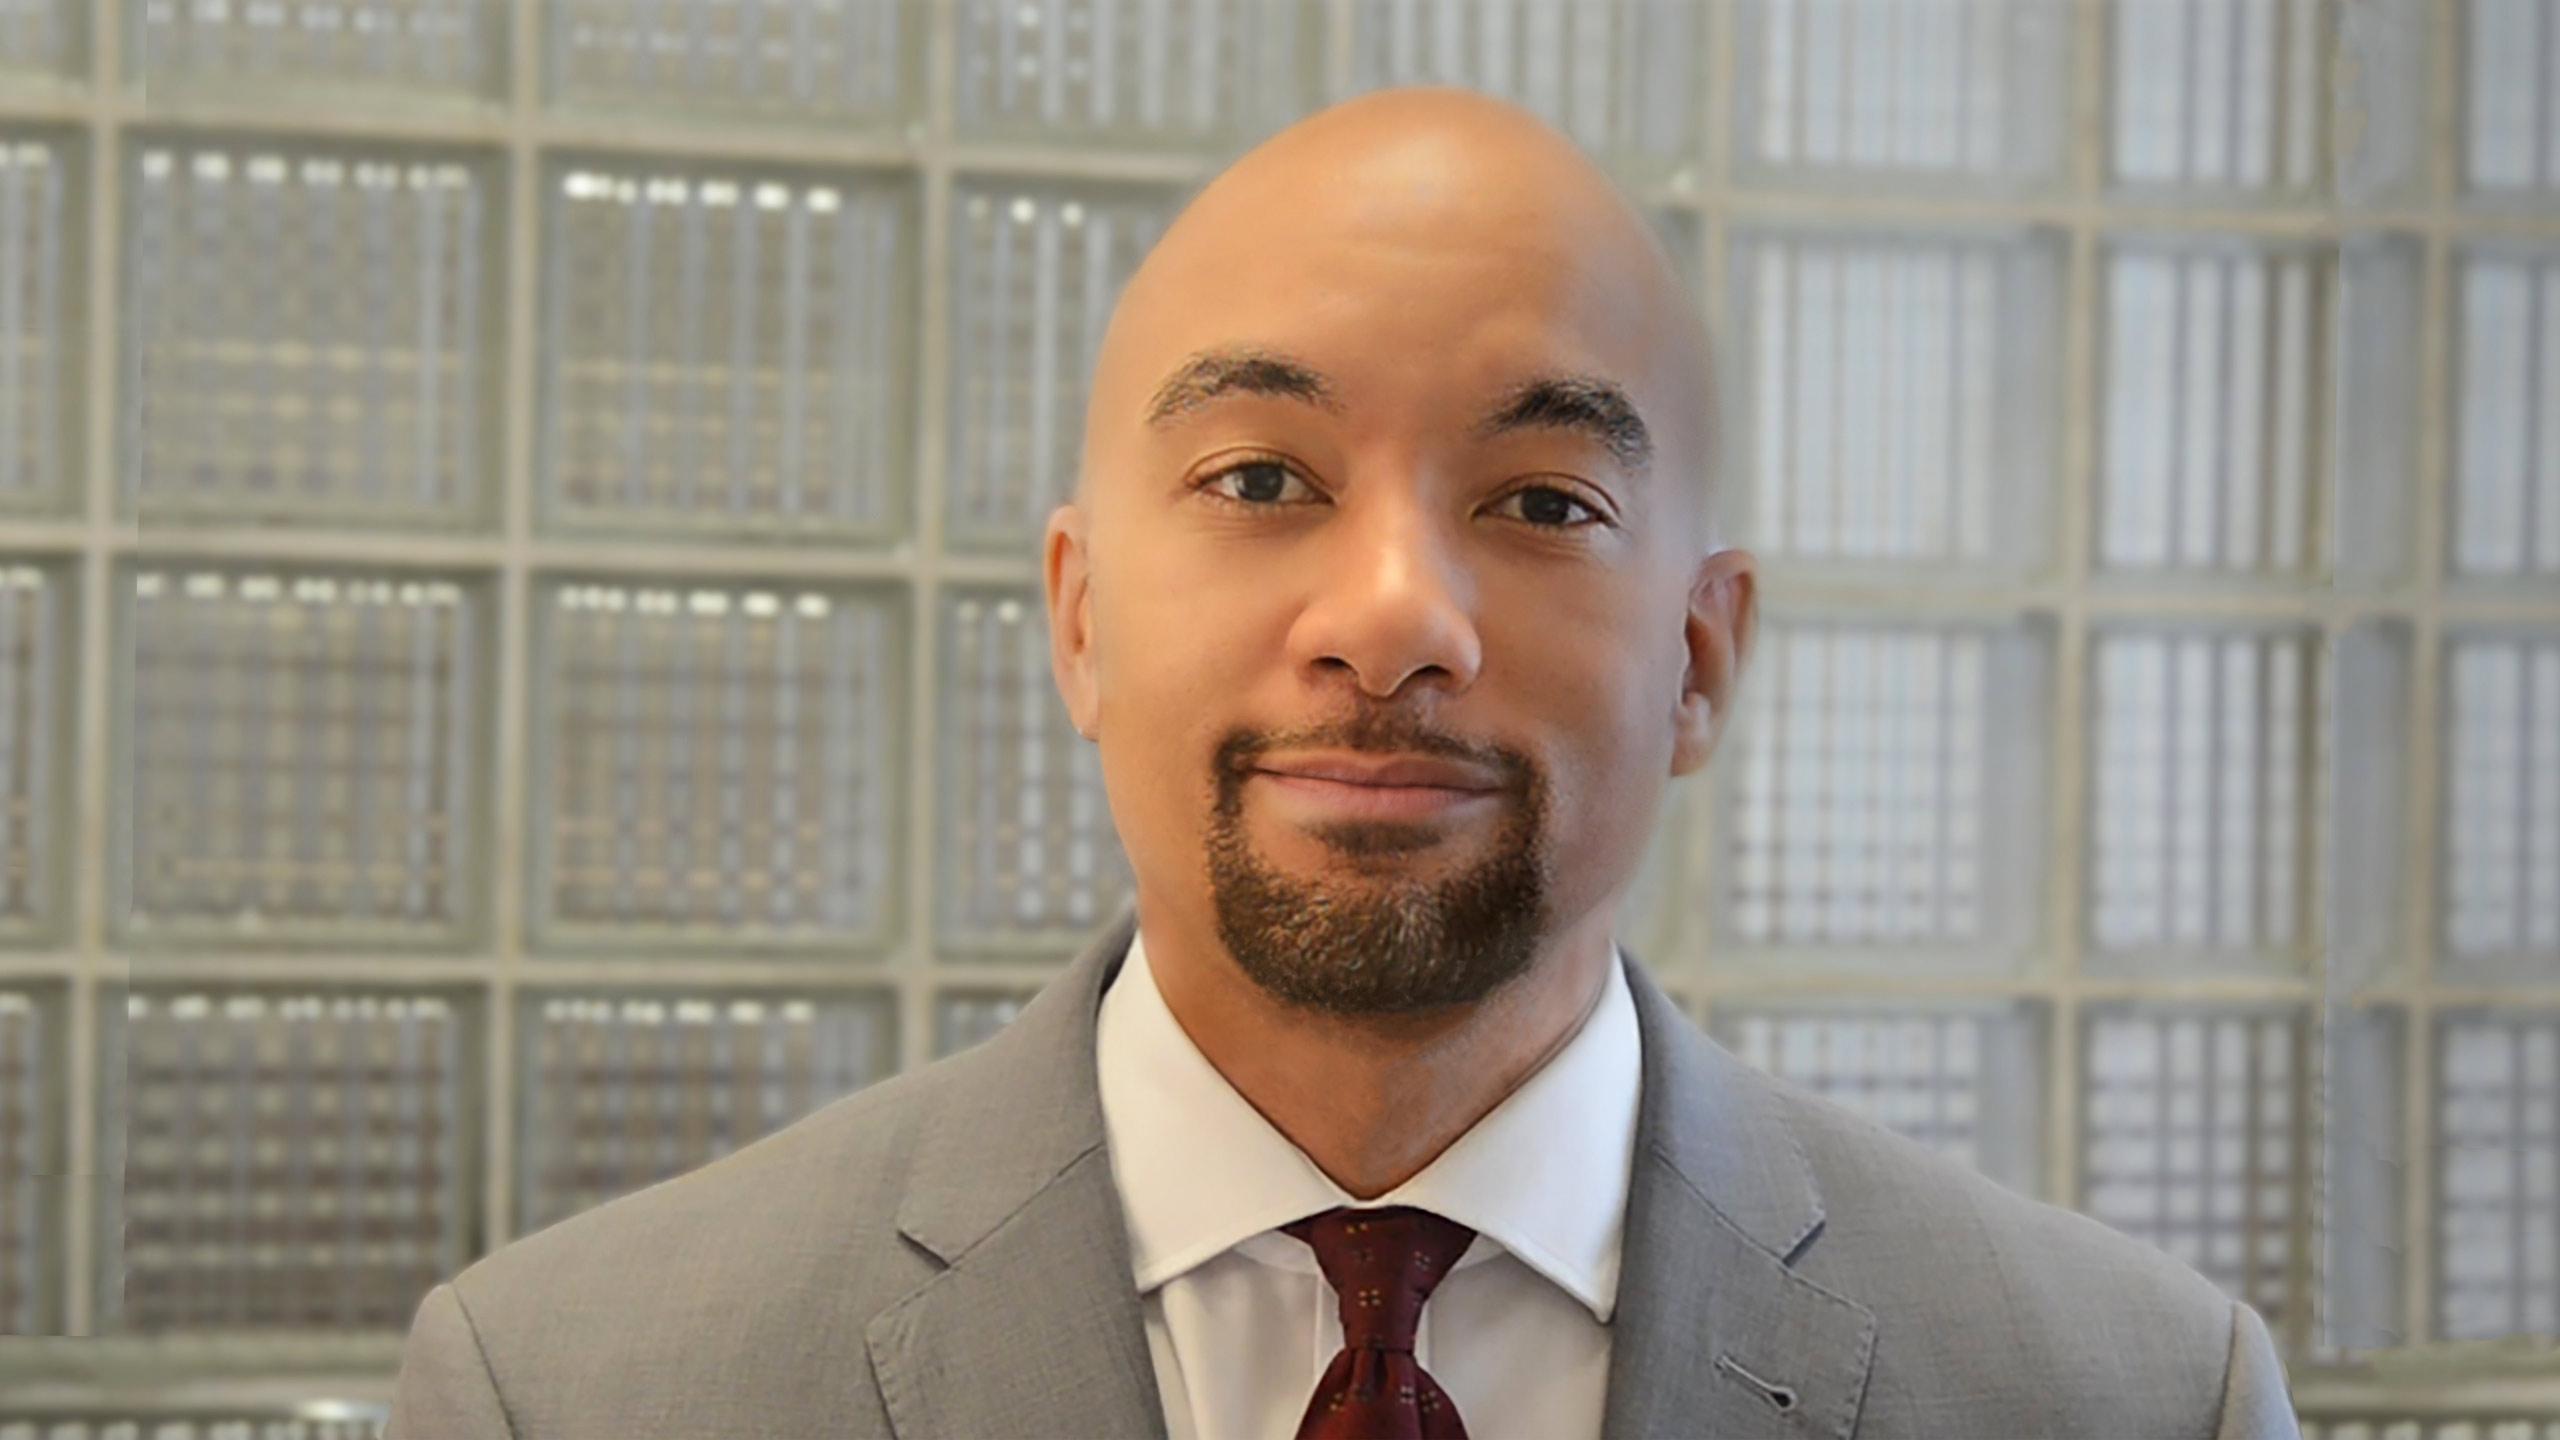 Meet Park Faculty Scholar Kanton Reynolds